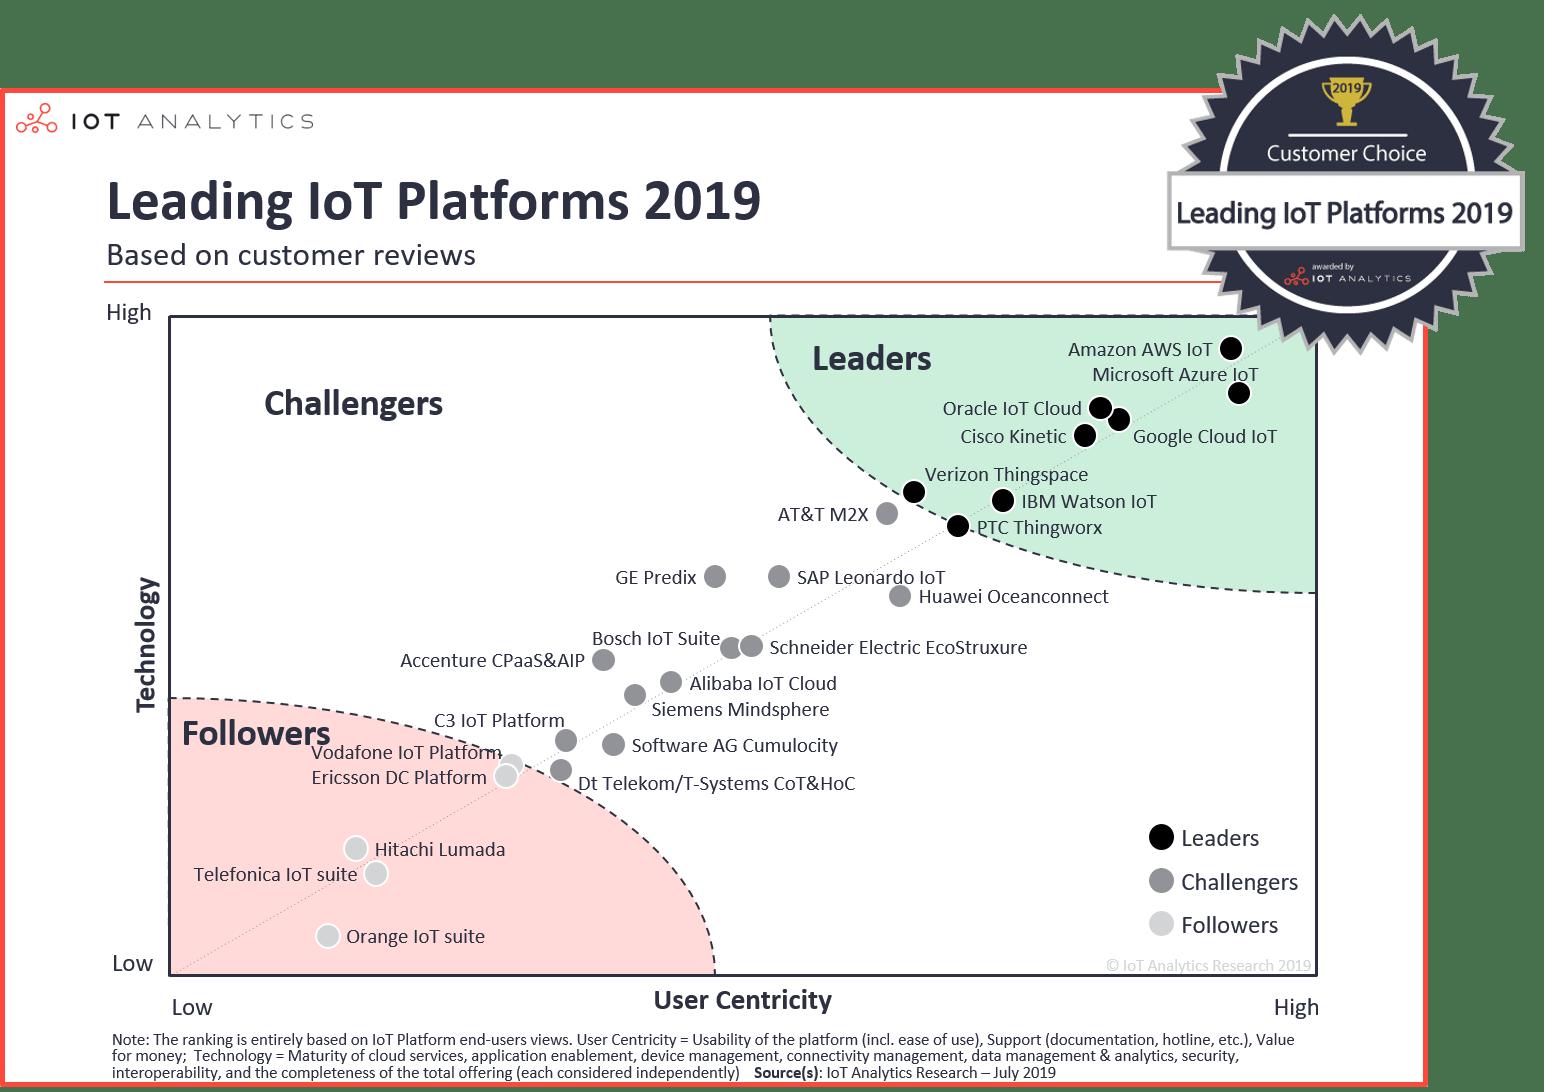 Leading IoT Platforms 2019